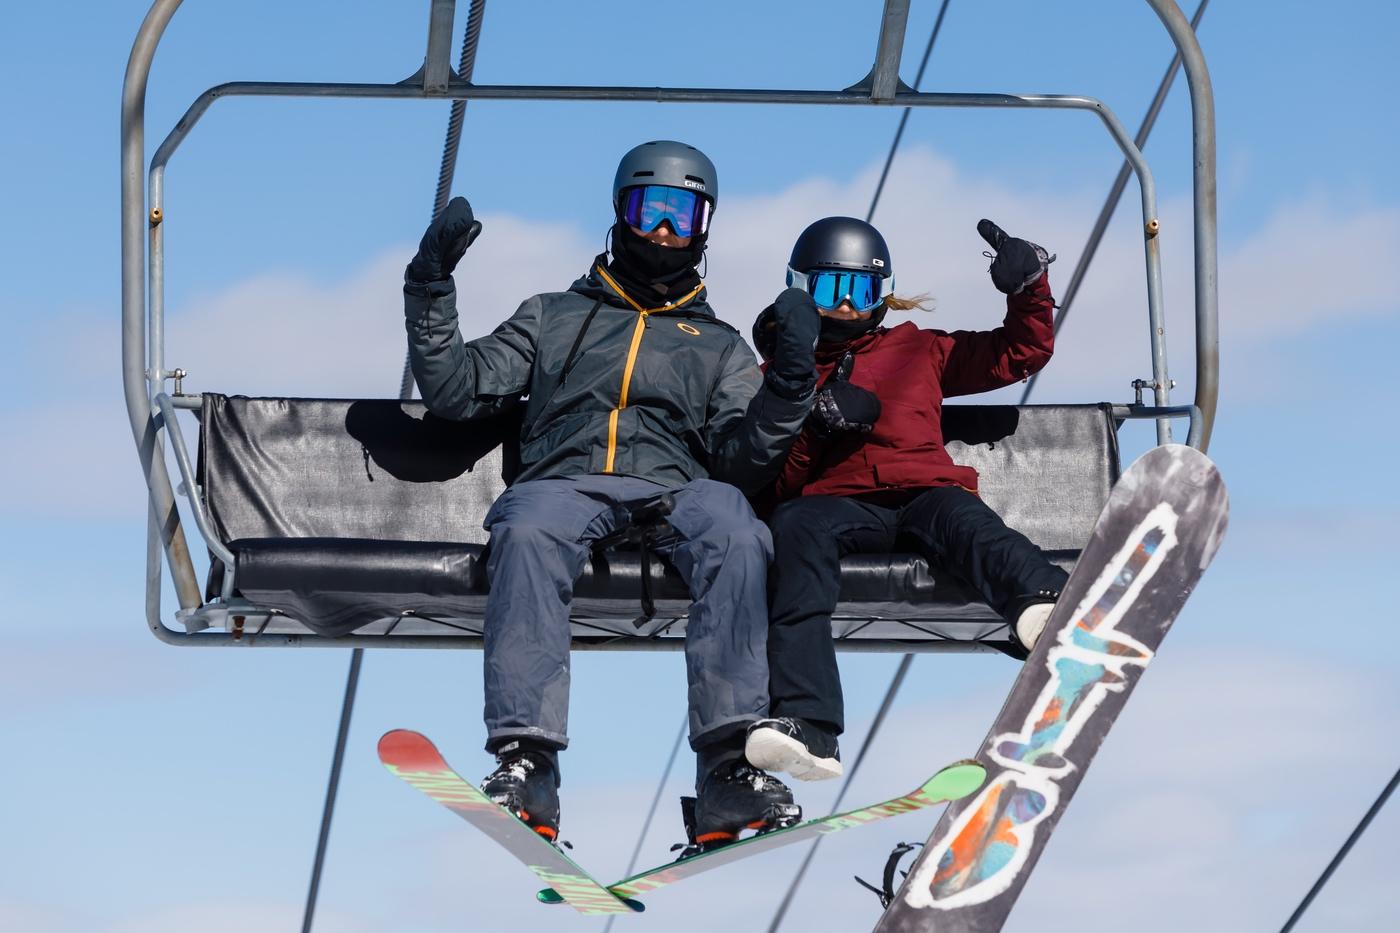 WinterKids Downhill 24 2021 SDP 3162